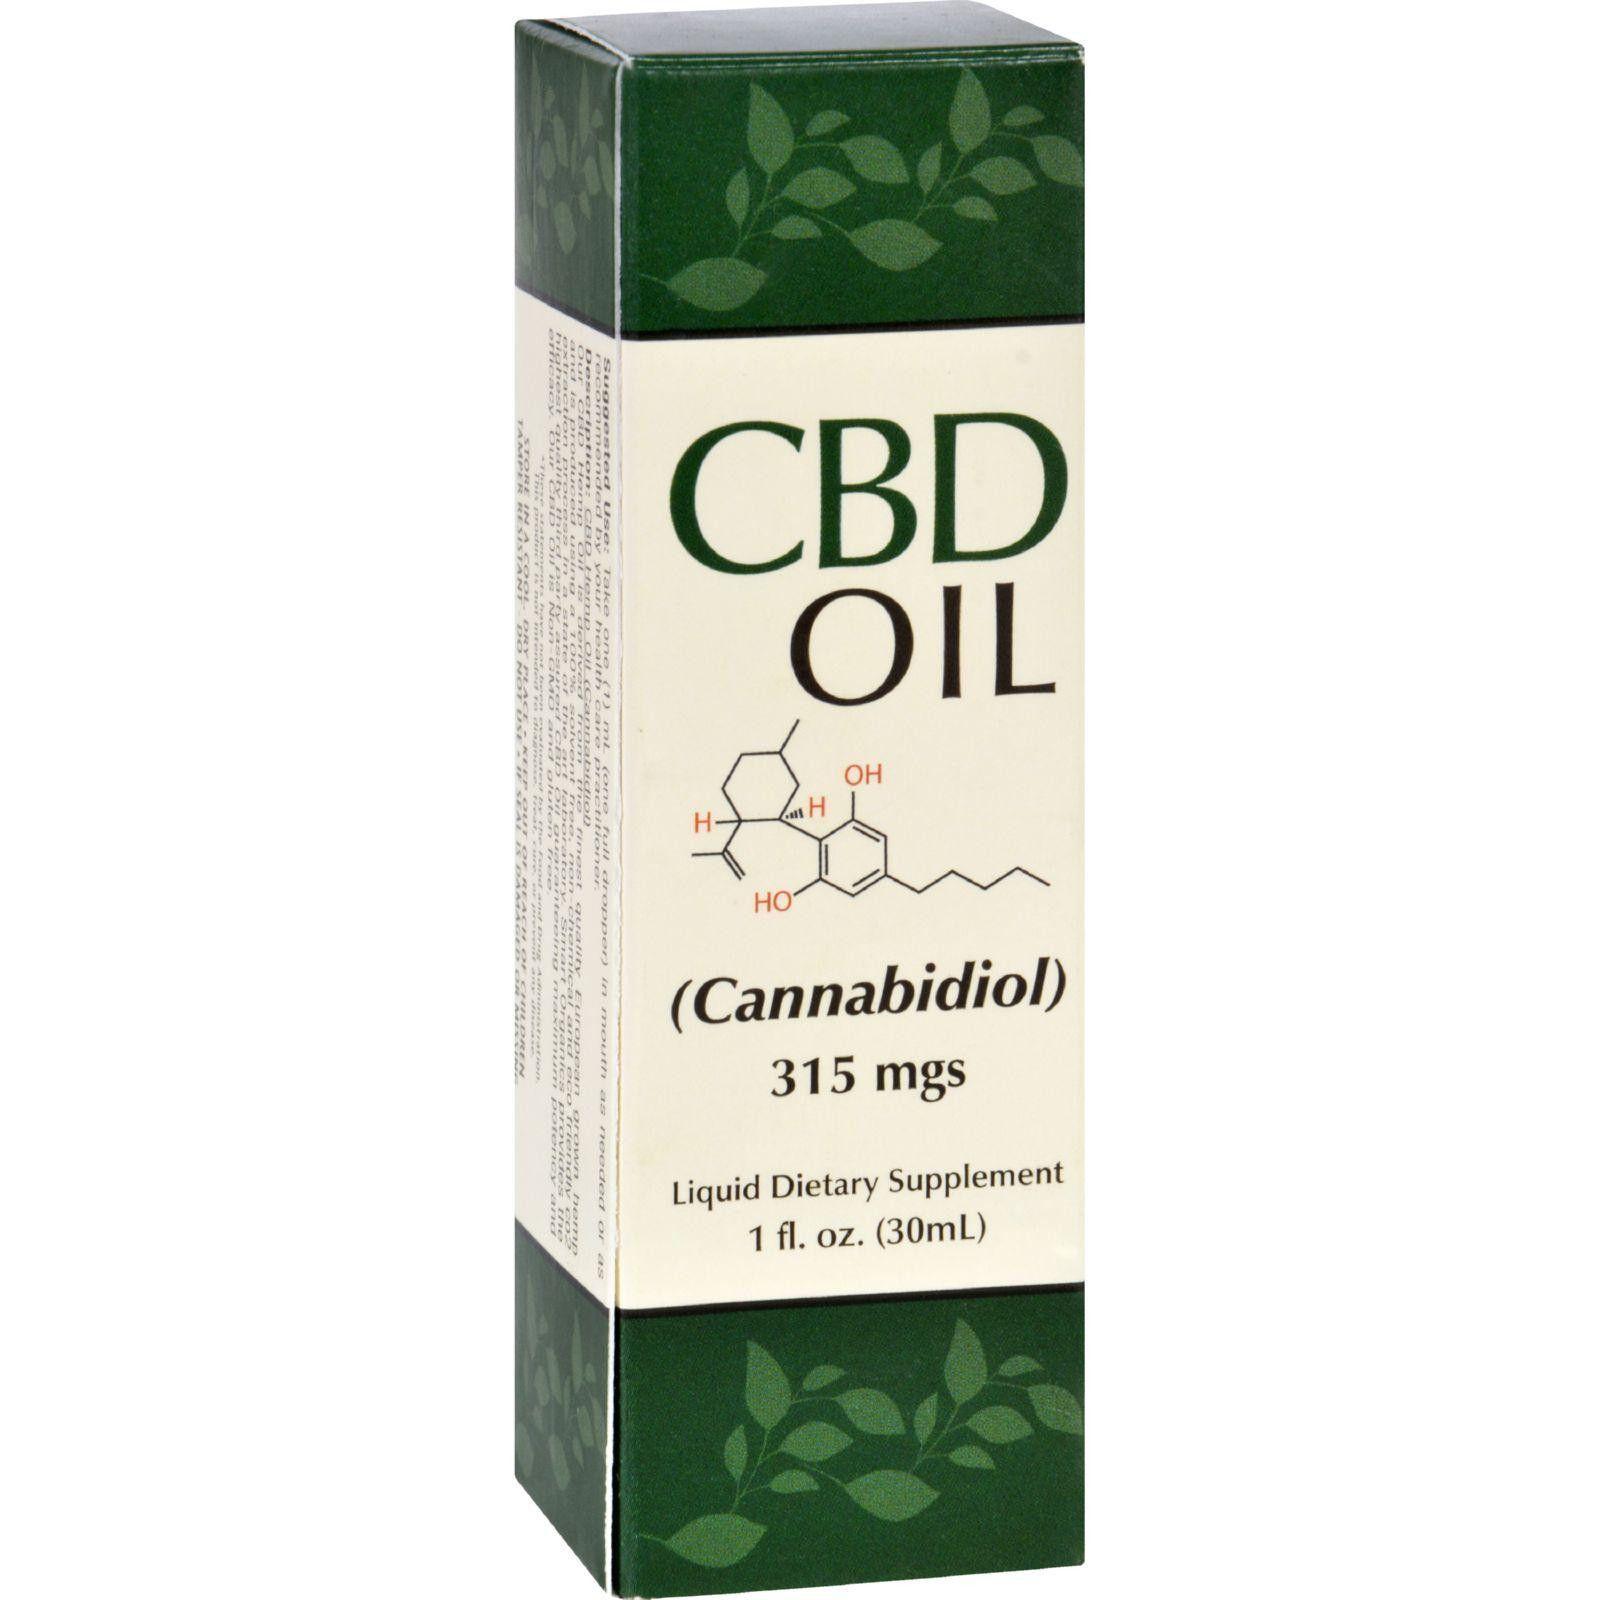 Image result for CBD Oil For Nutrition